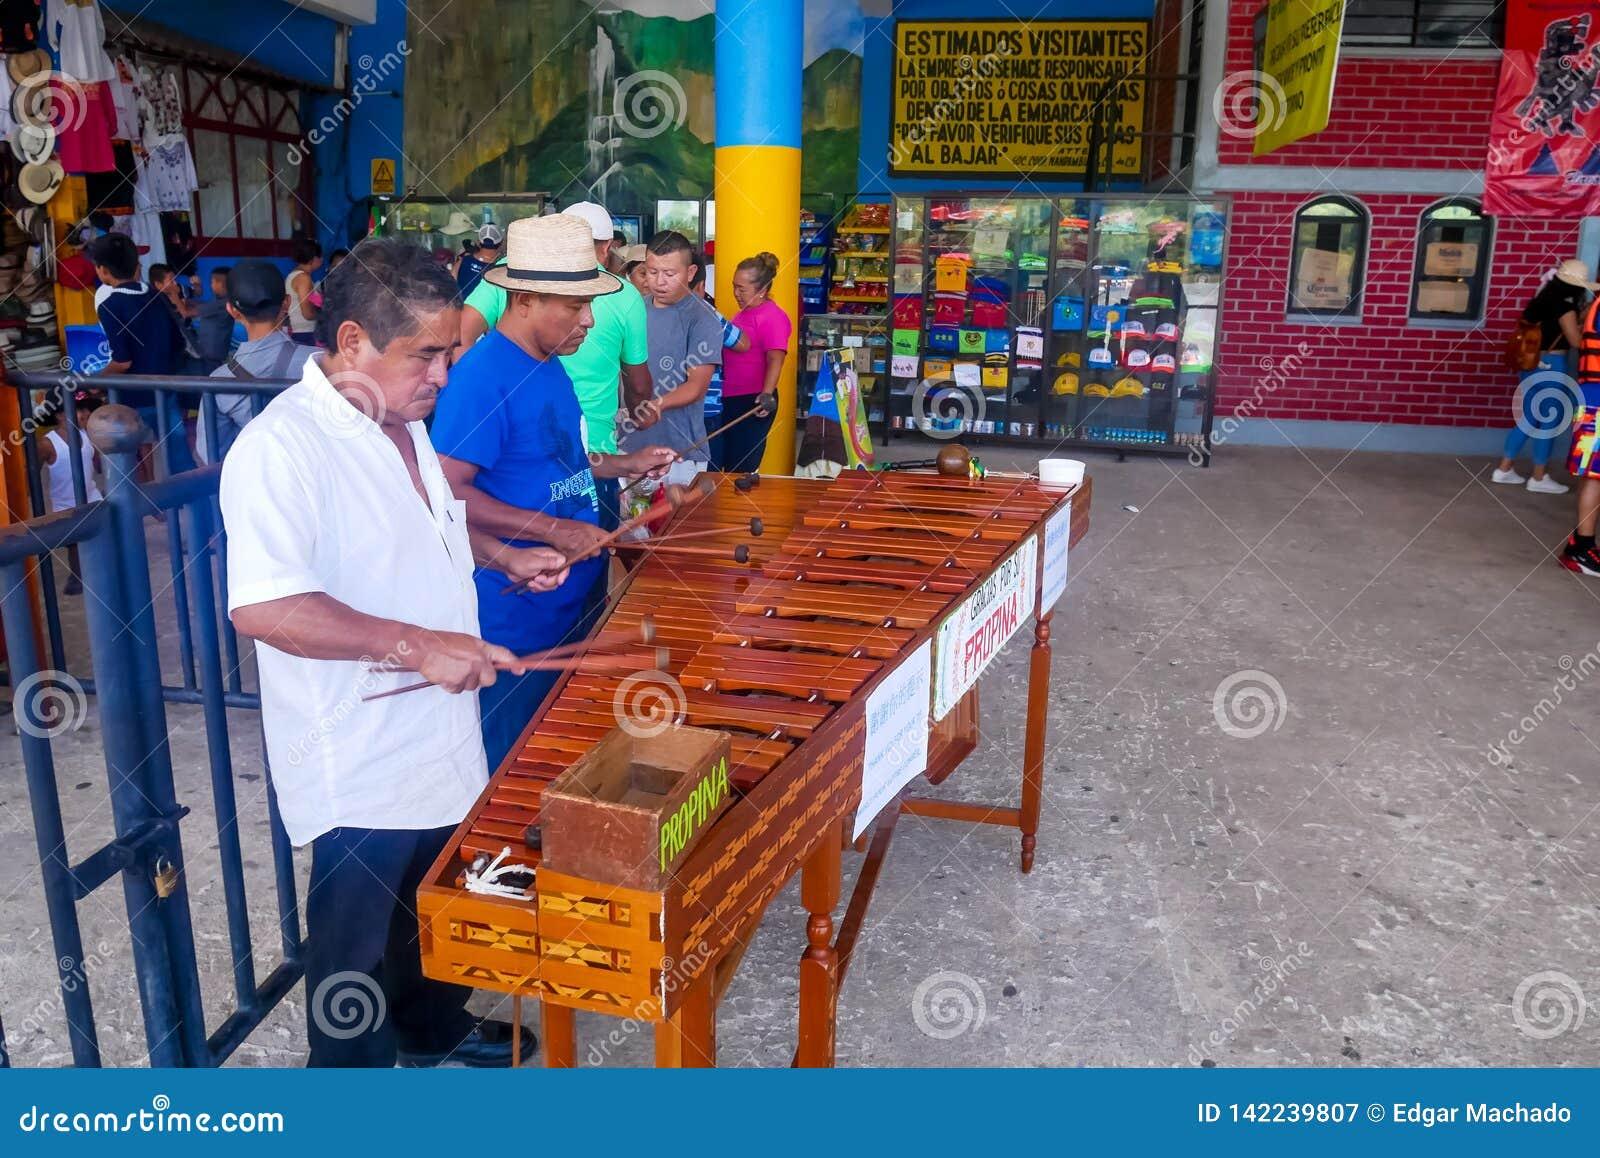 Marimba Musicians at Chiapas